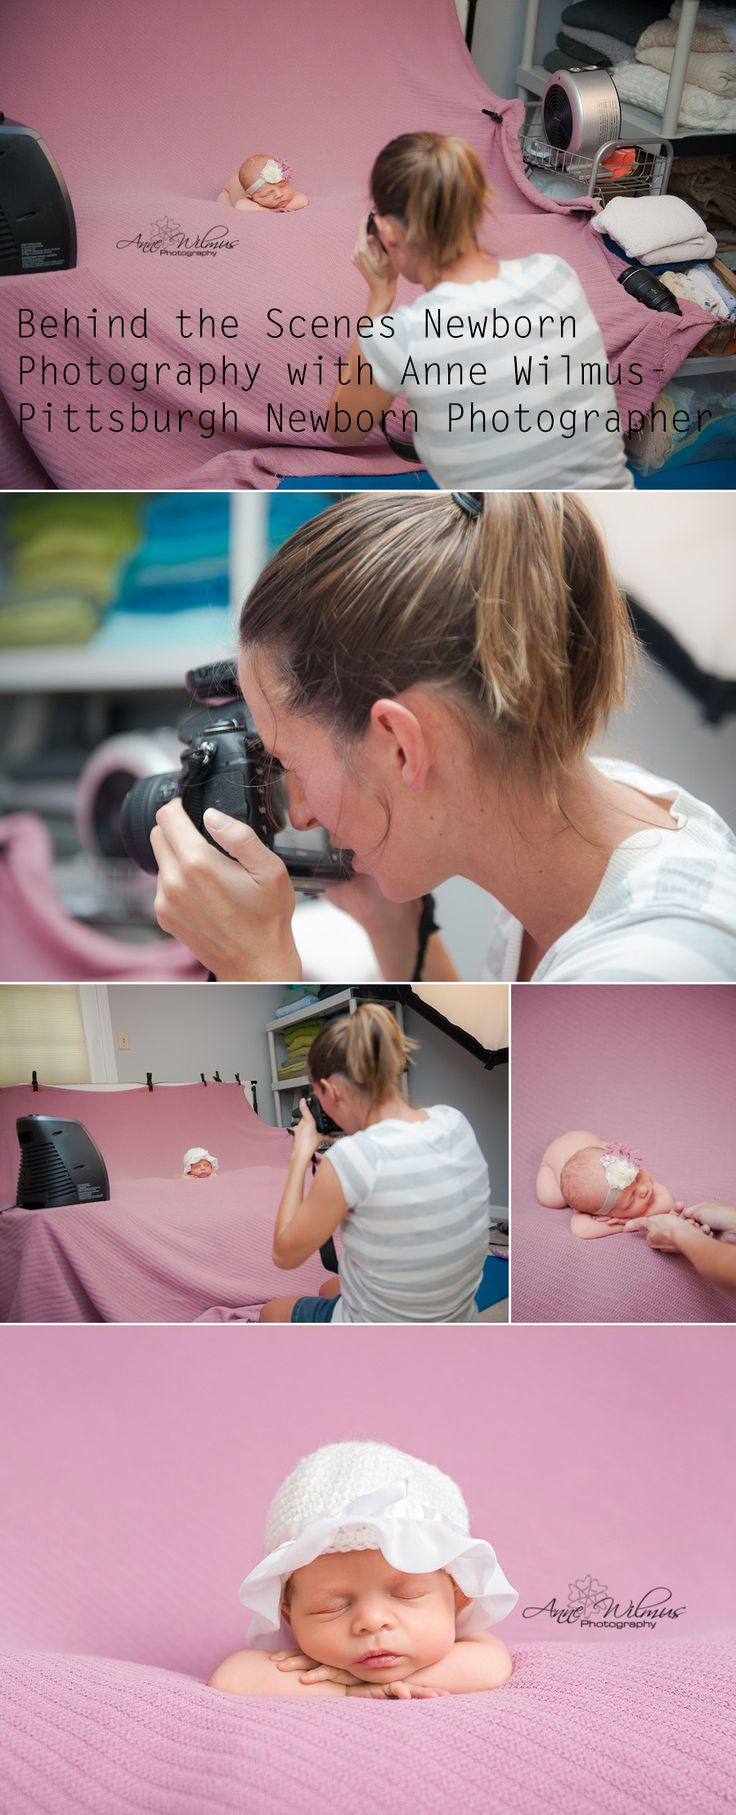 BEHIND THE SCENES OF NEWBORN STUDIO PHOTOGRAPHY WITH ANNE WILMUS- PITTSBURGH NEWBORN PHOTOGRAPHER